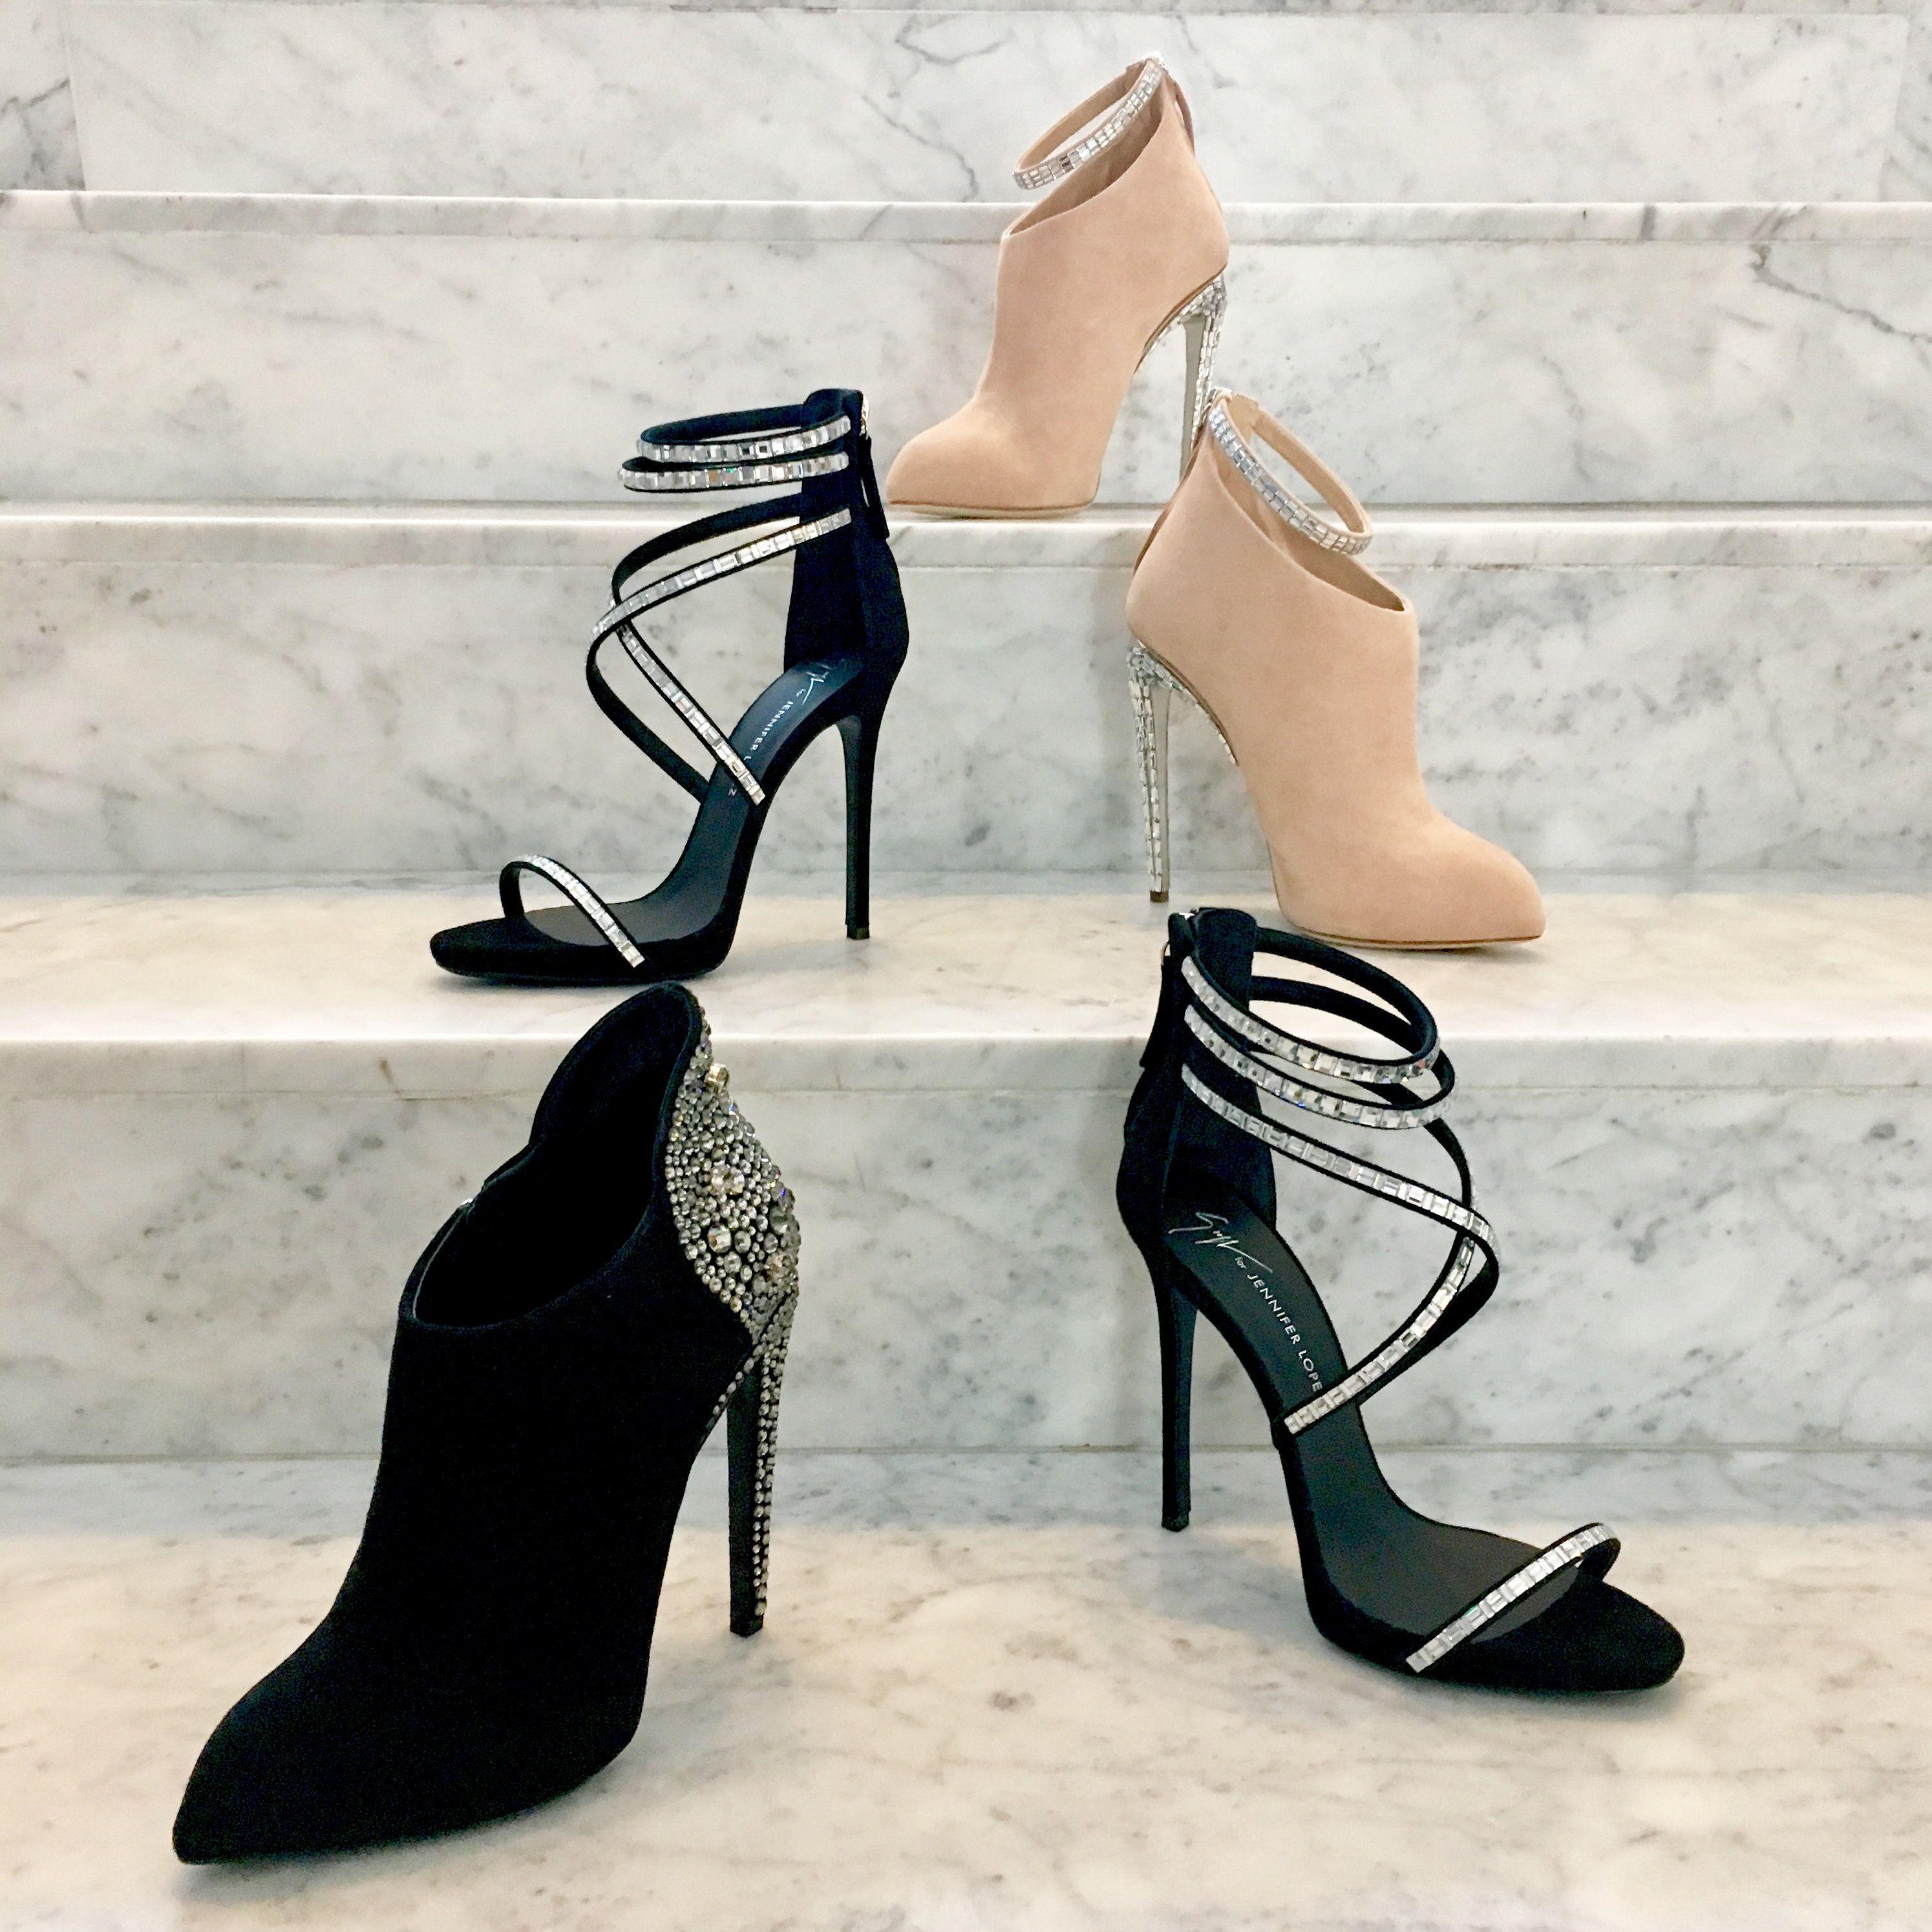 Giuseppe Zanotti And Jennifer Lopez Return With A Gorgeous New Line Up Giuseppexjennifer Jlo Giuseppe Zanotti Heels Fashion Heels